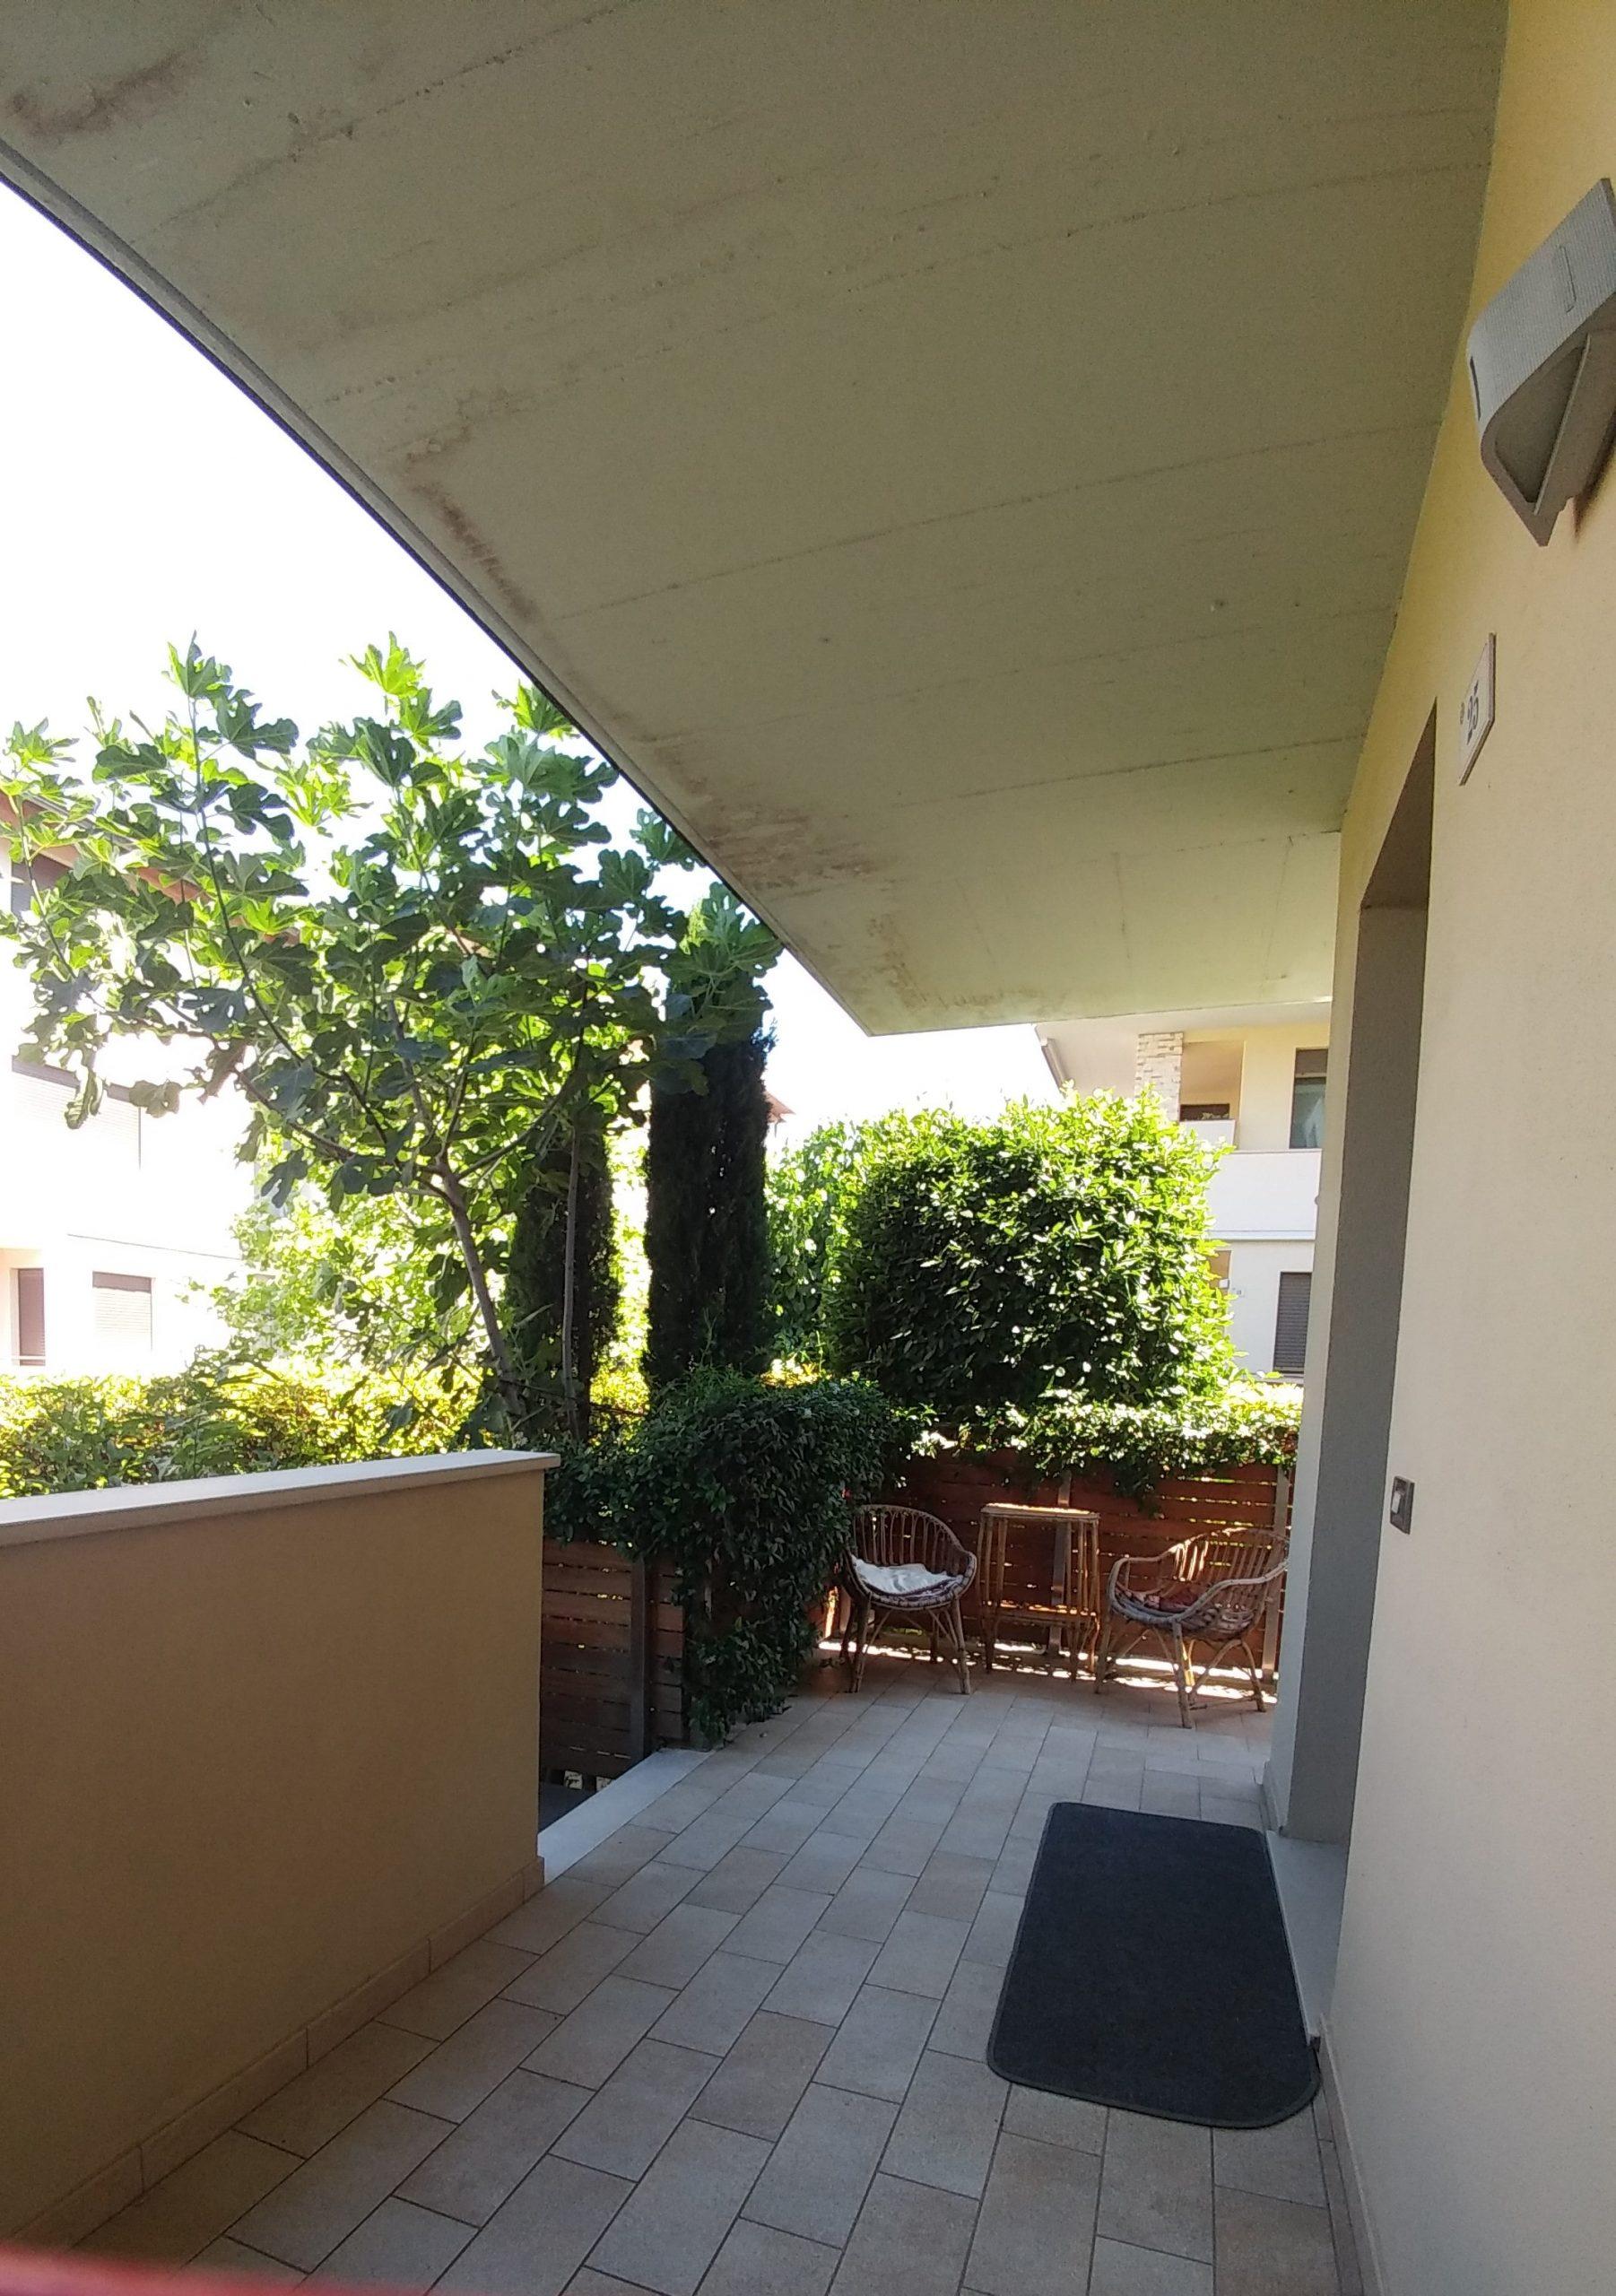 Vendesi appartamento con giardino e 3 posti auto Castel Bolognese